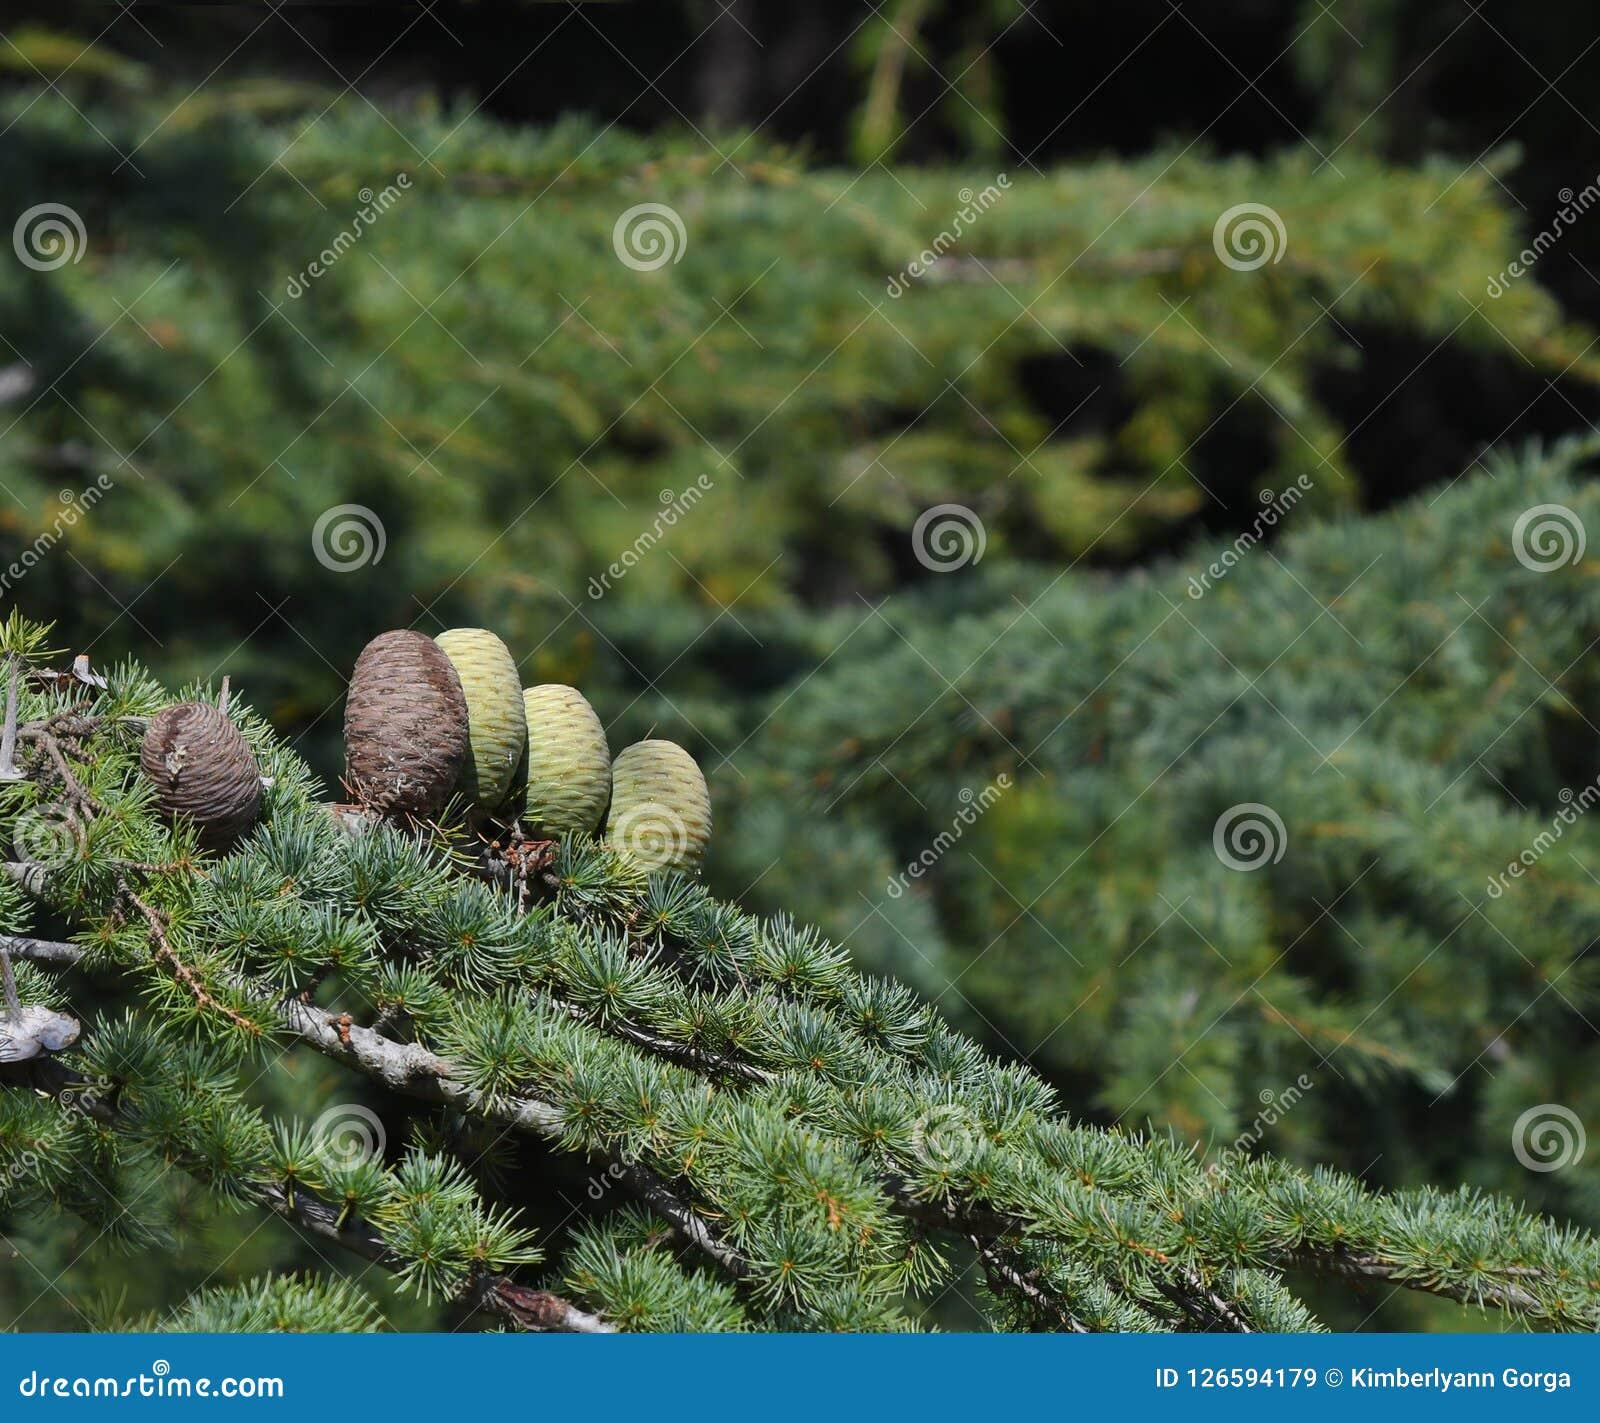 Pine cones on Atlantic / Blue Atlas cedar tree Cedrus atlantica